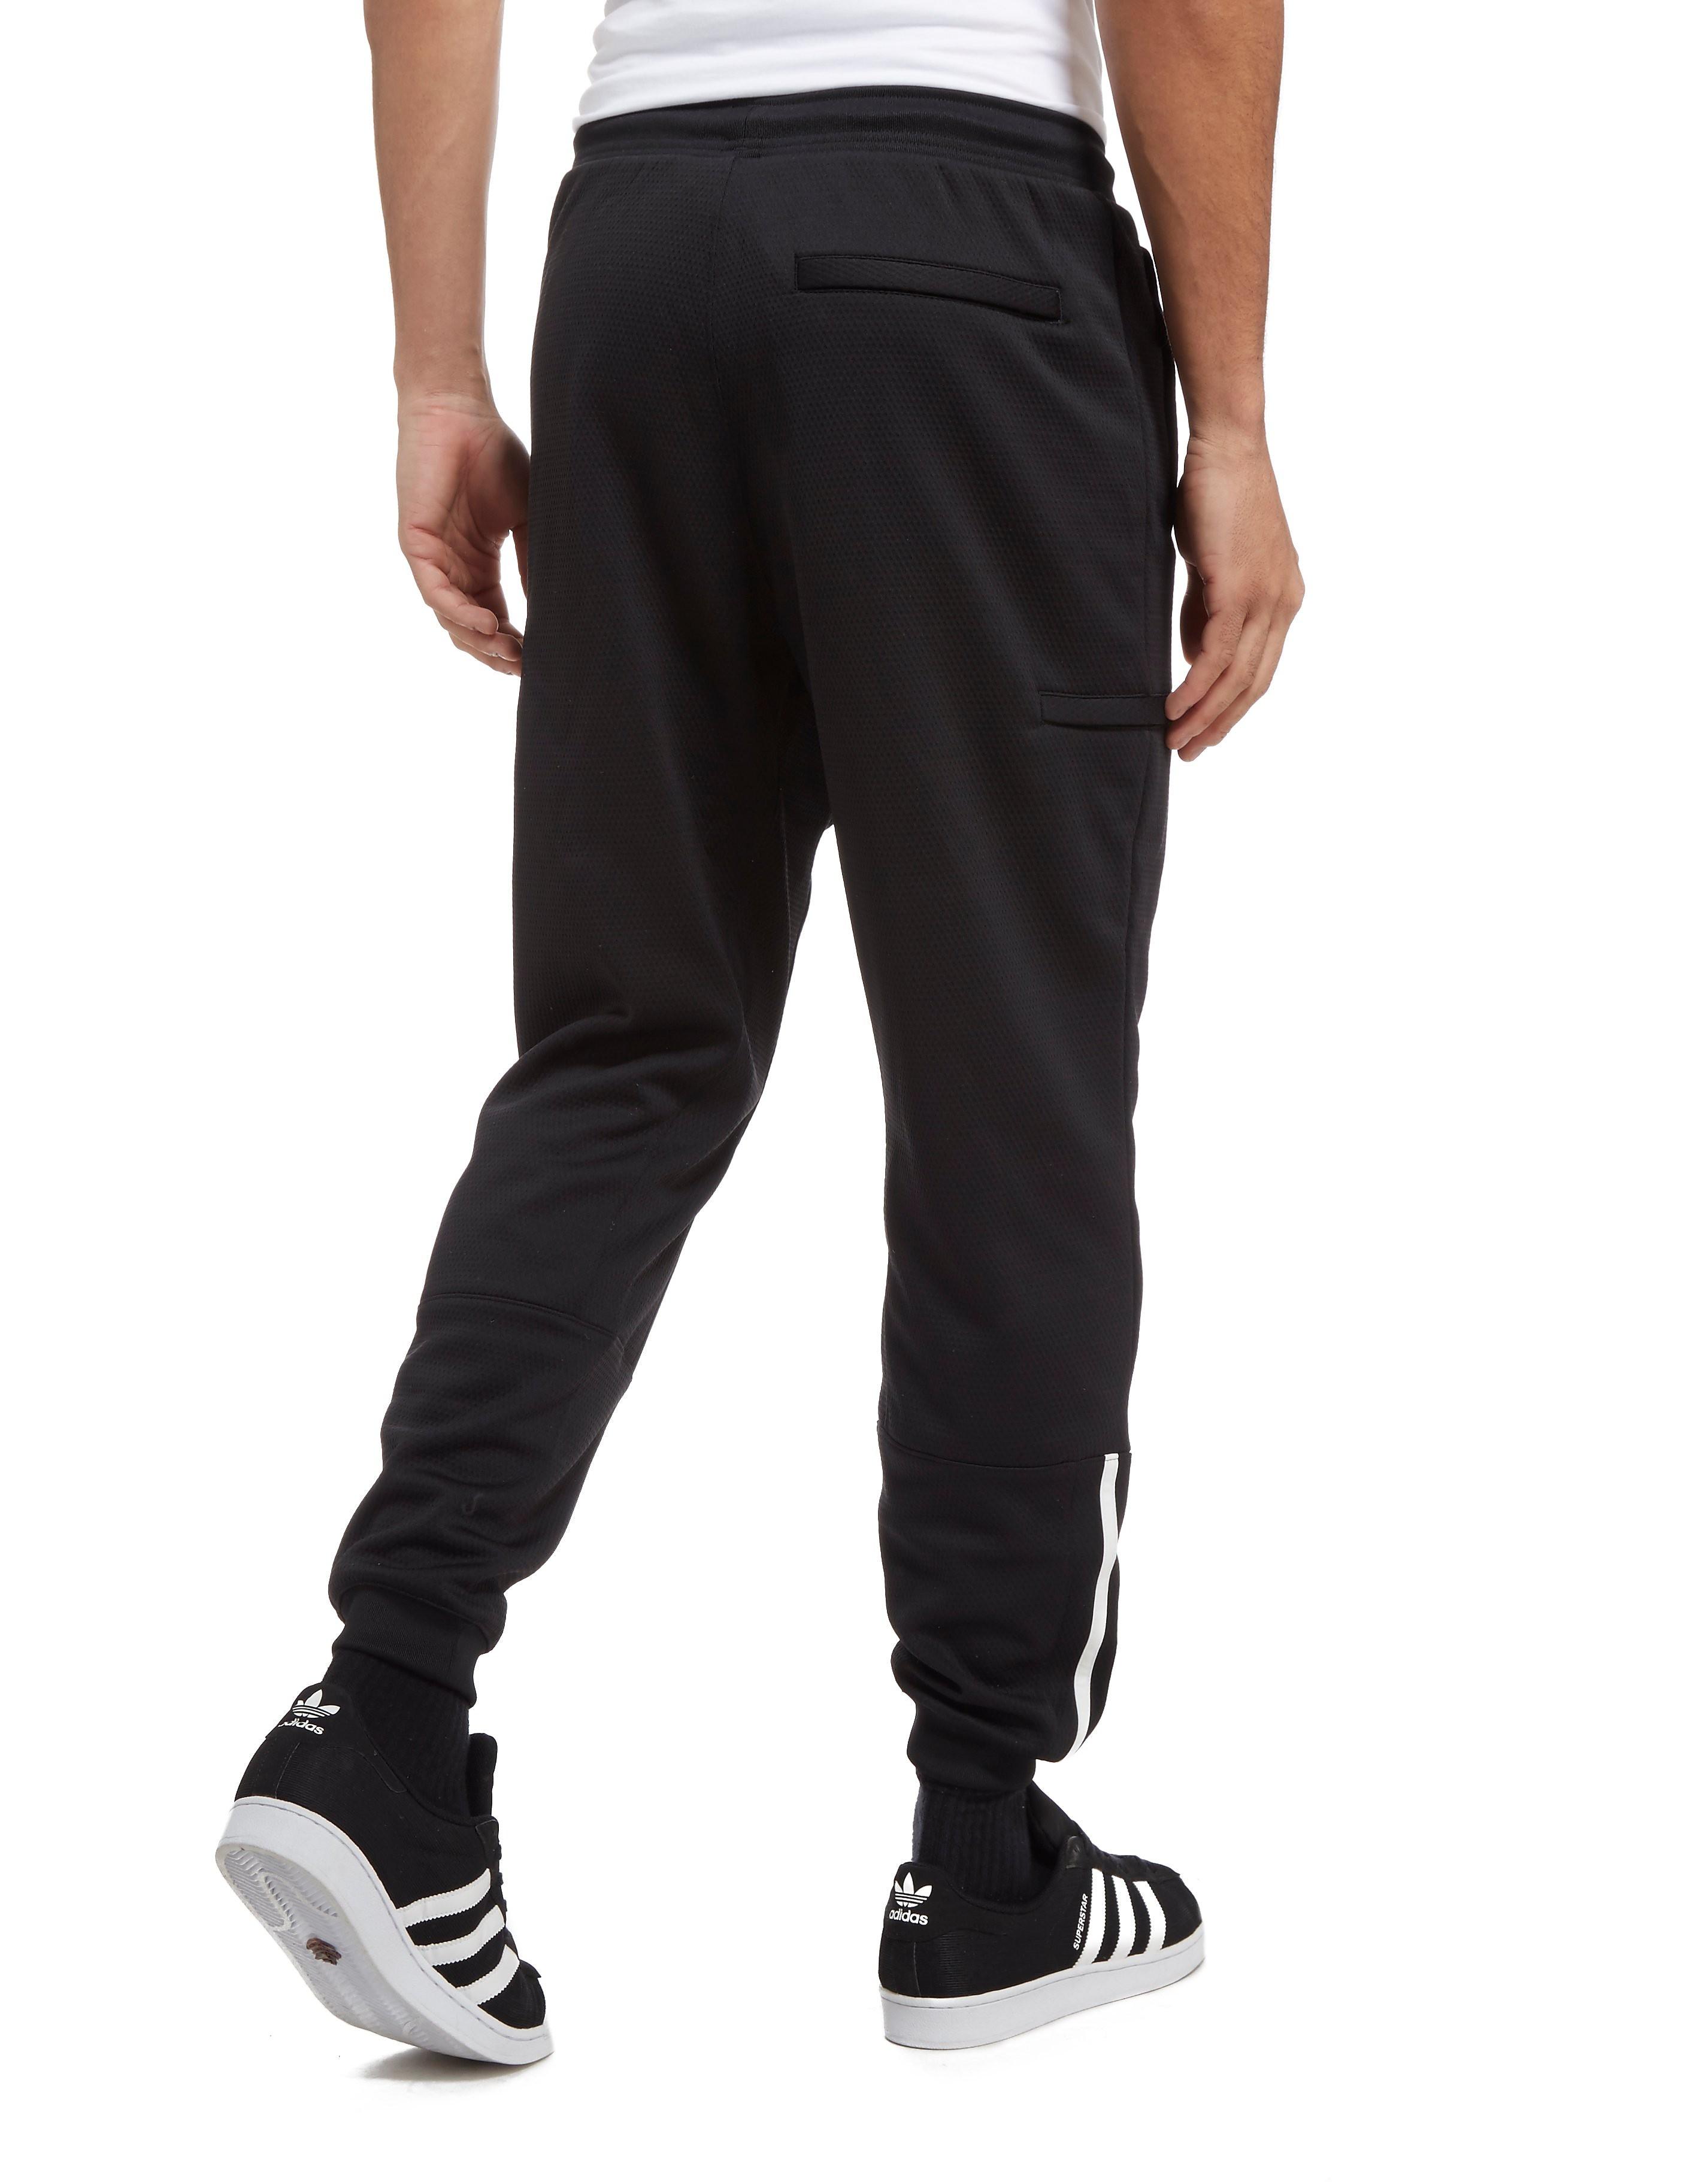 adidas Originals Nova Polyester Pants